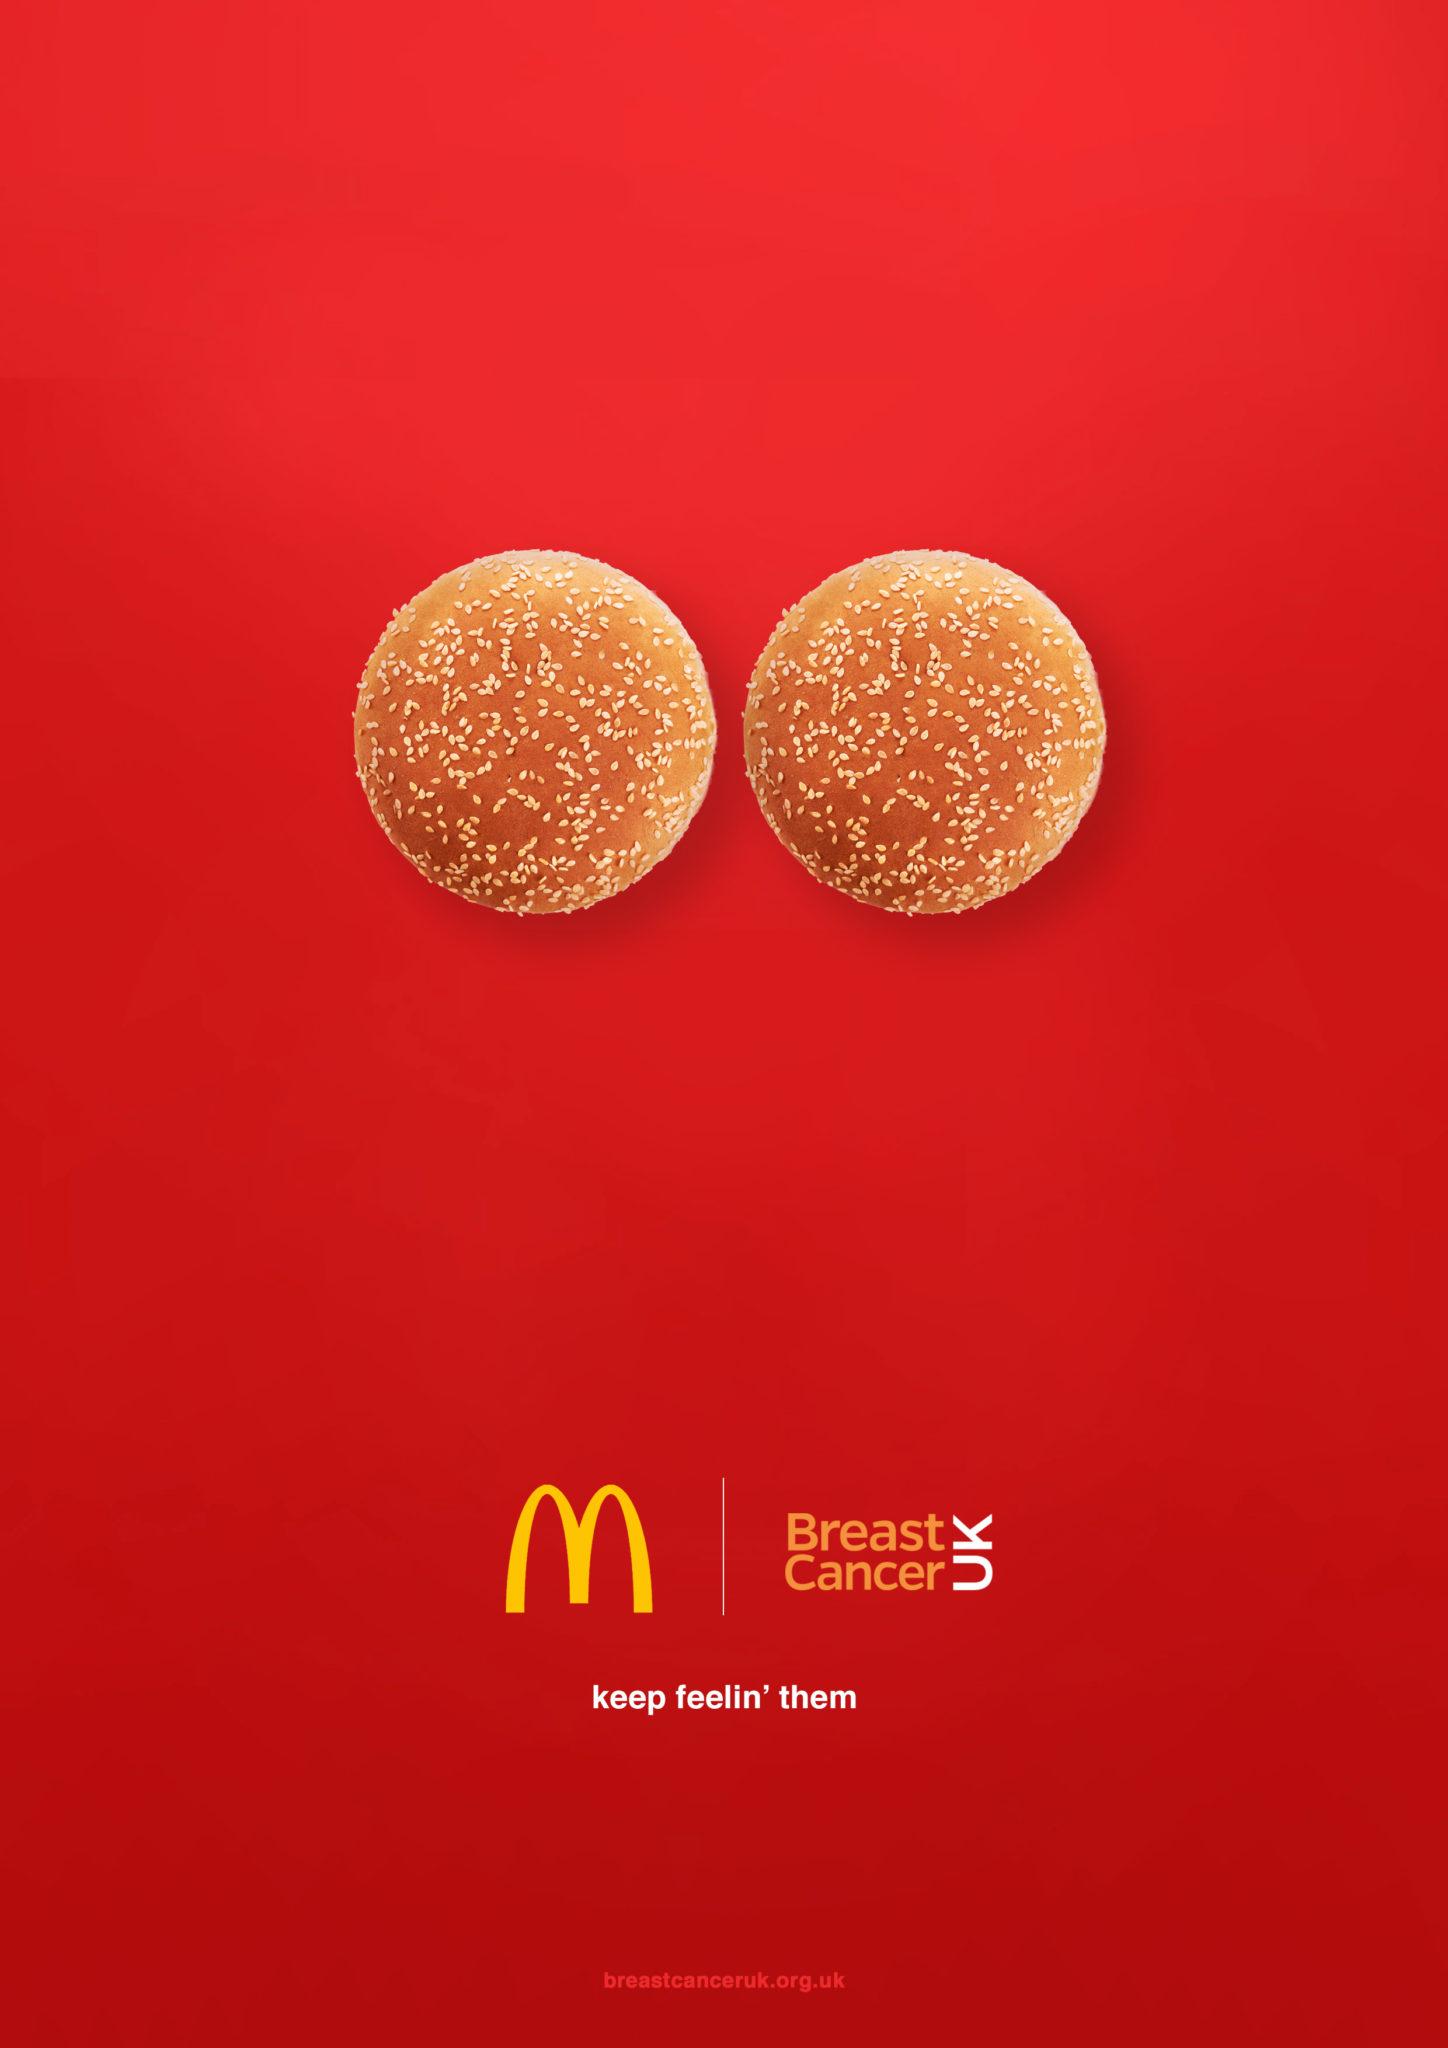 Mcdonalds Poster - breast Cancer awareness